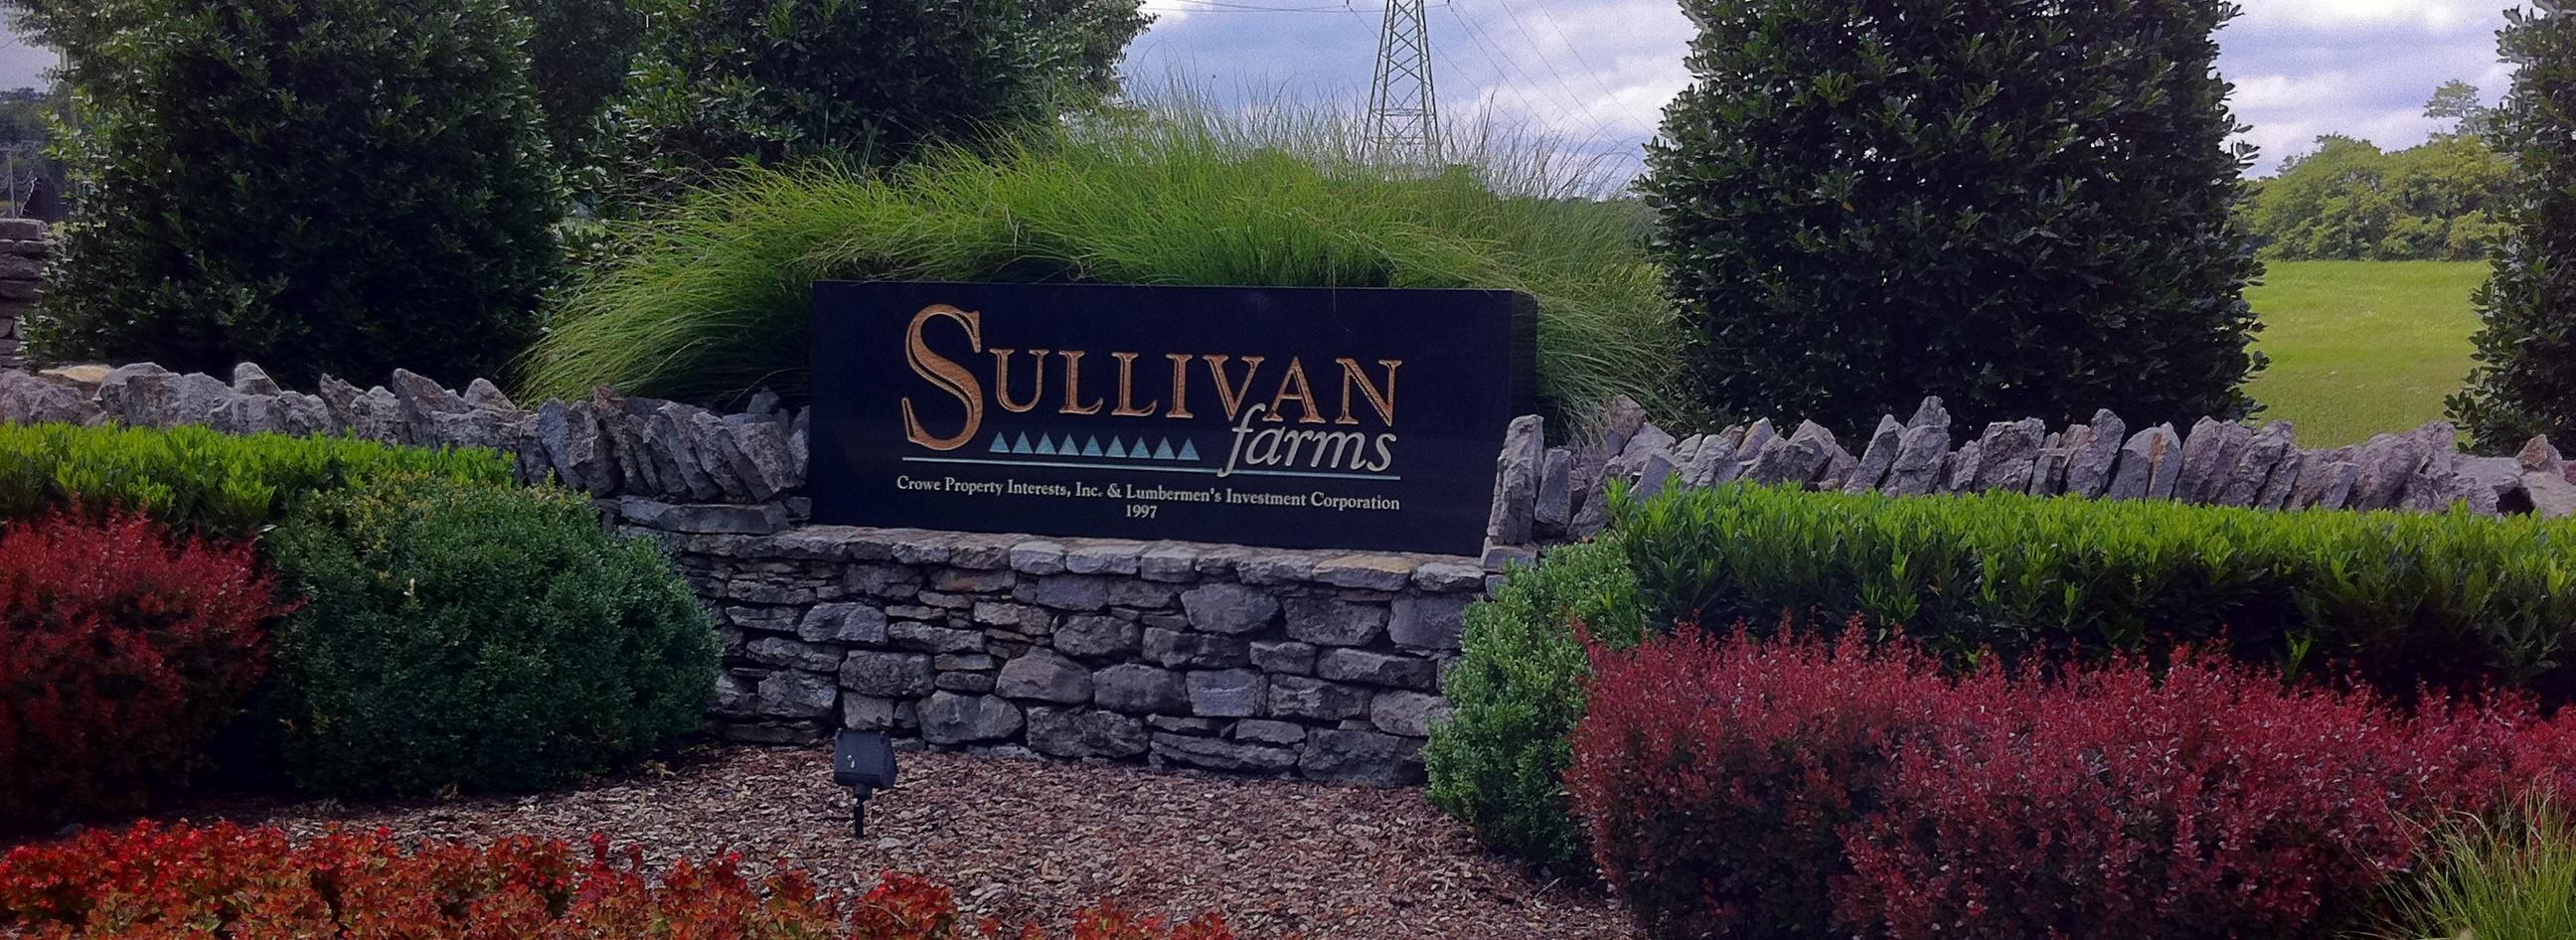 Sullivan Farms October 2011 Real Estate in Franklin